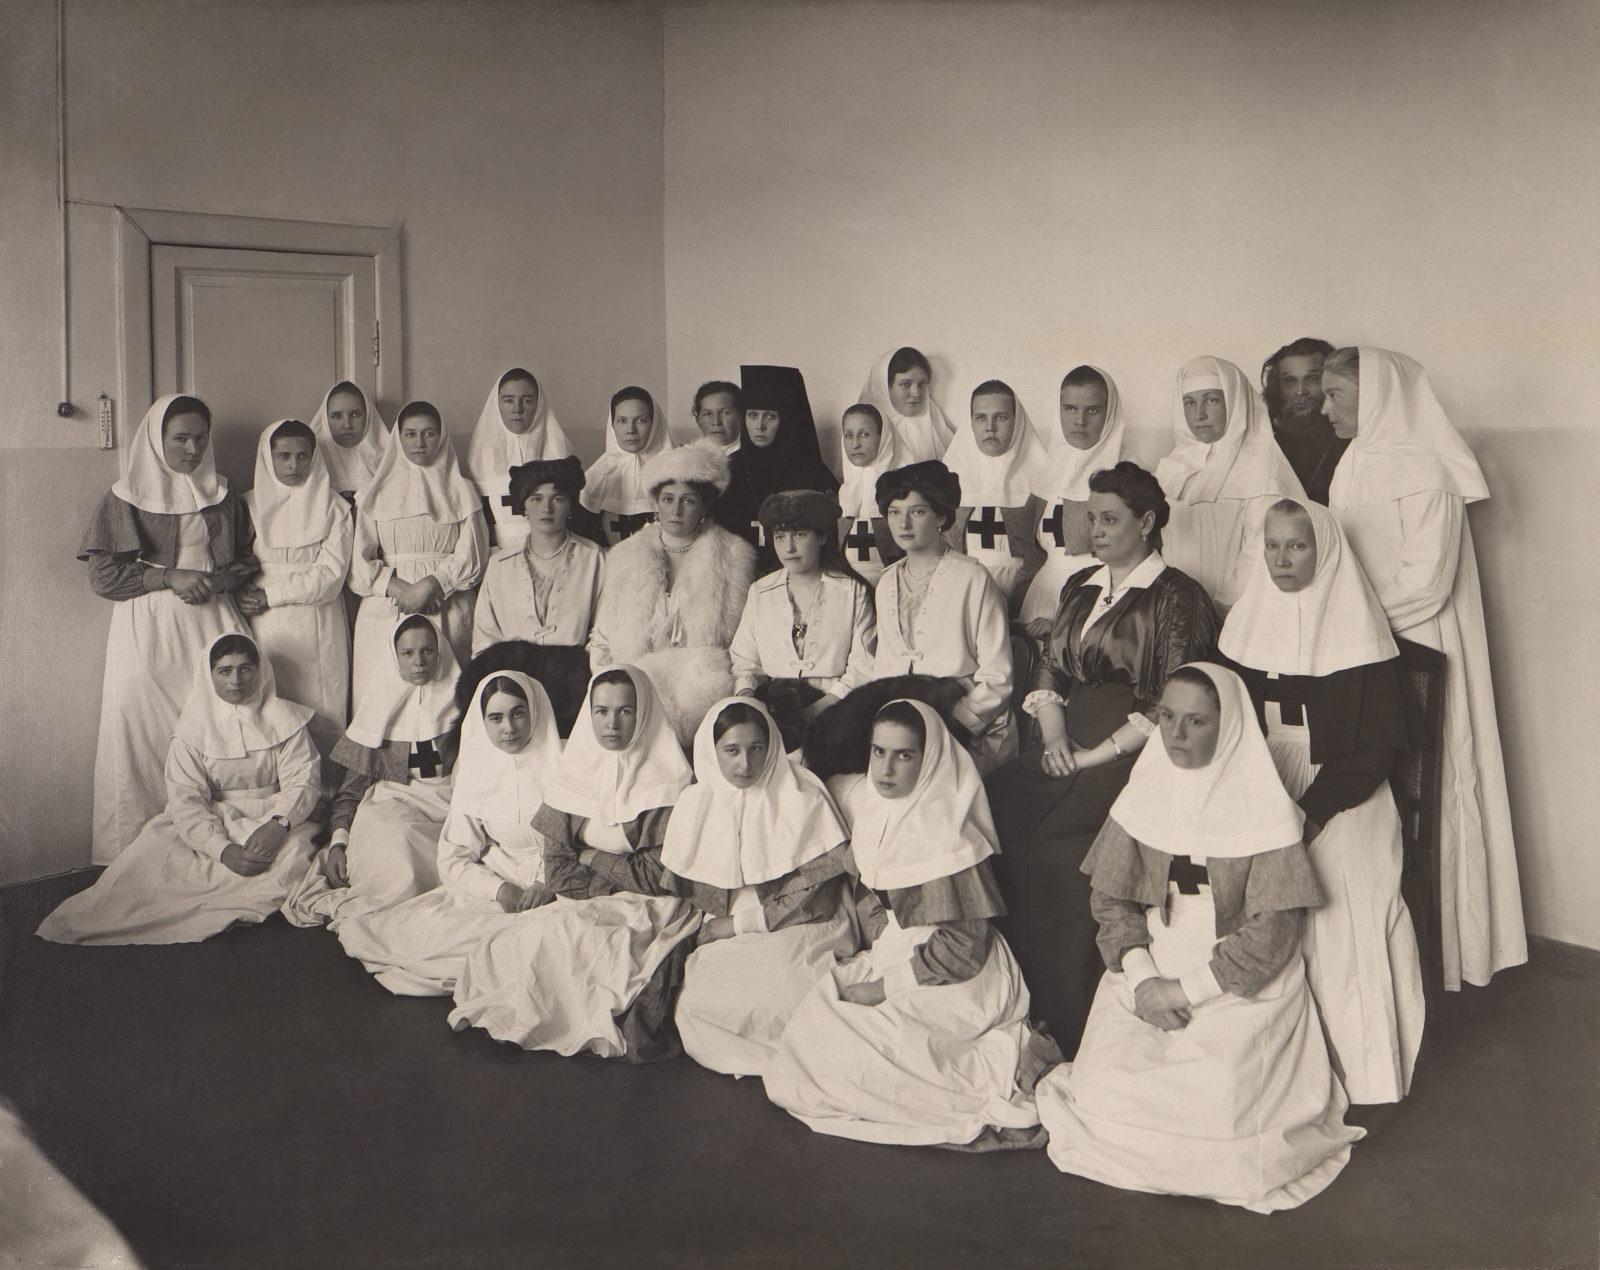 Grand Duchesses Olga, Tatiana, Anastasia, Empress Alexandra Feodorovna in the hospital for wounded soldiers.